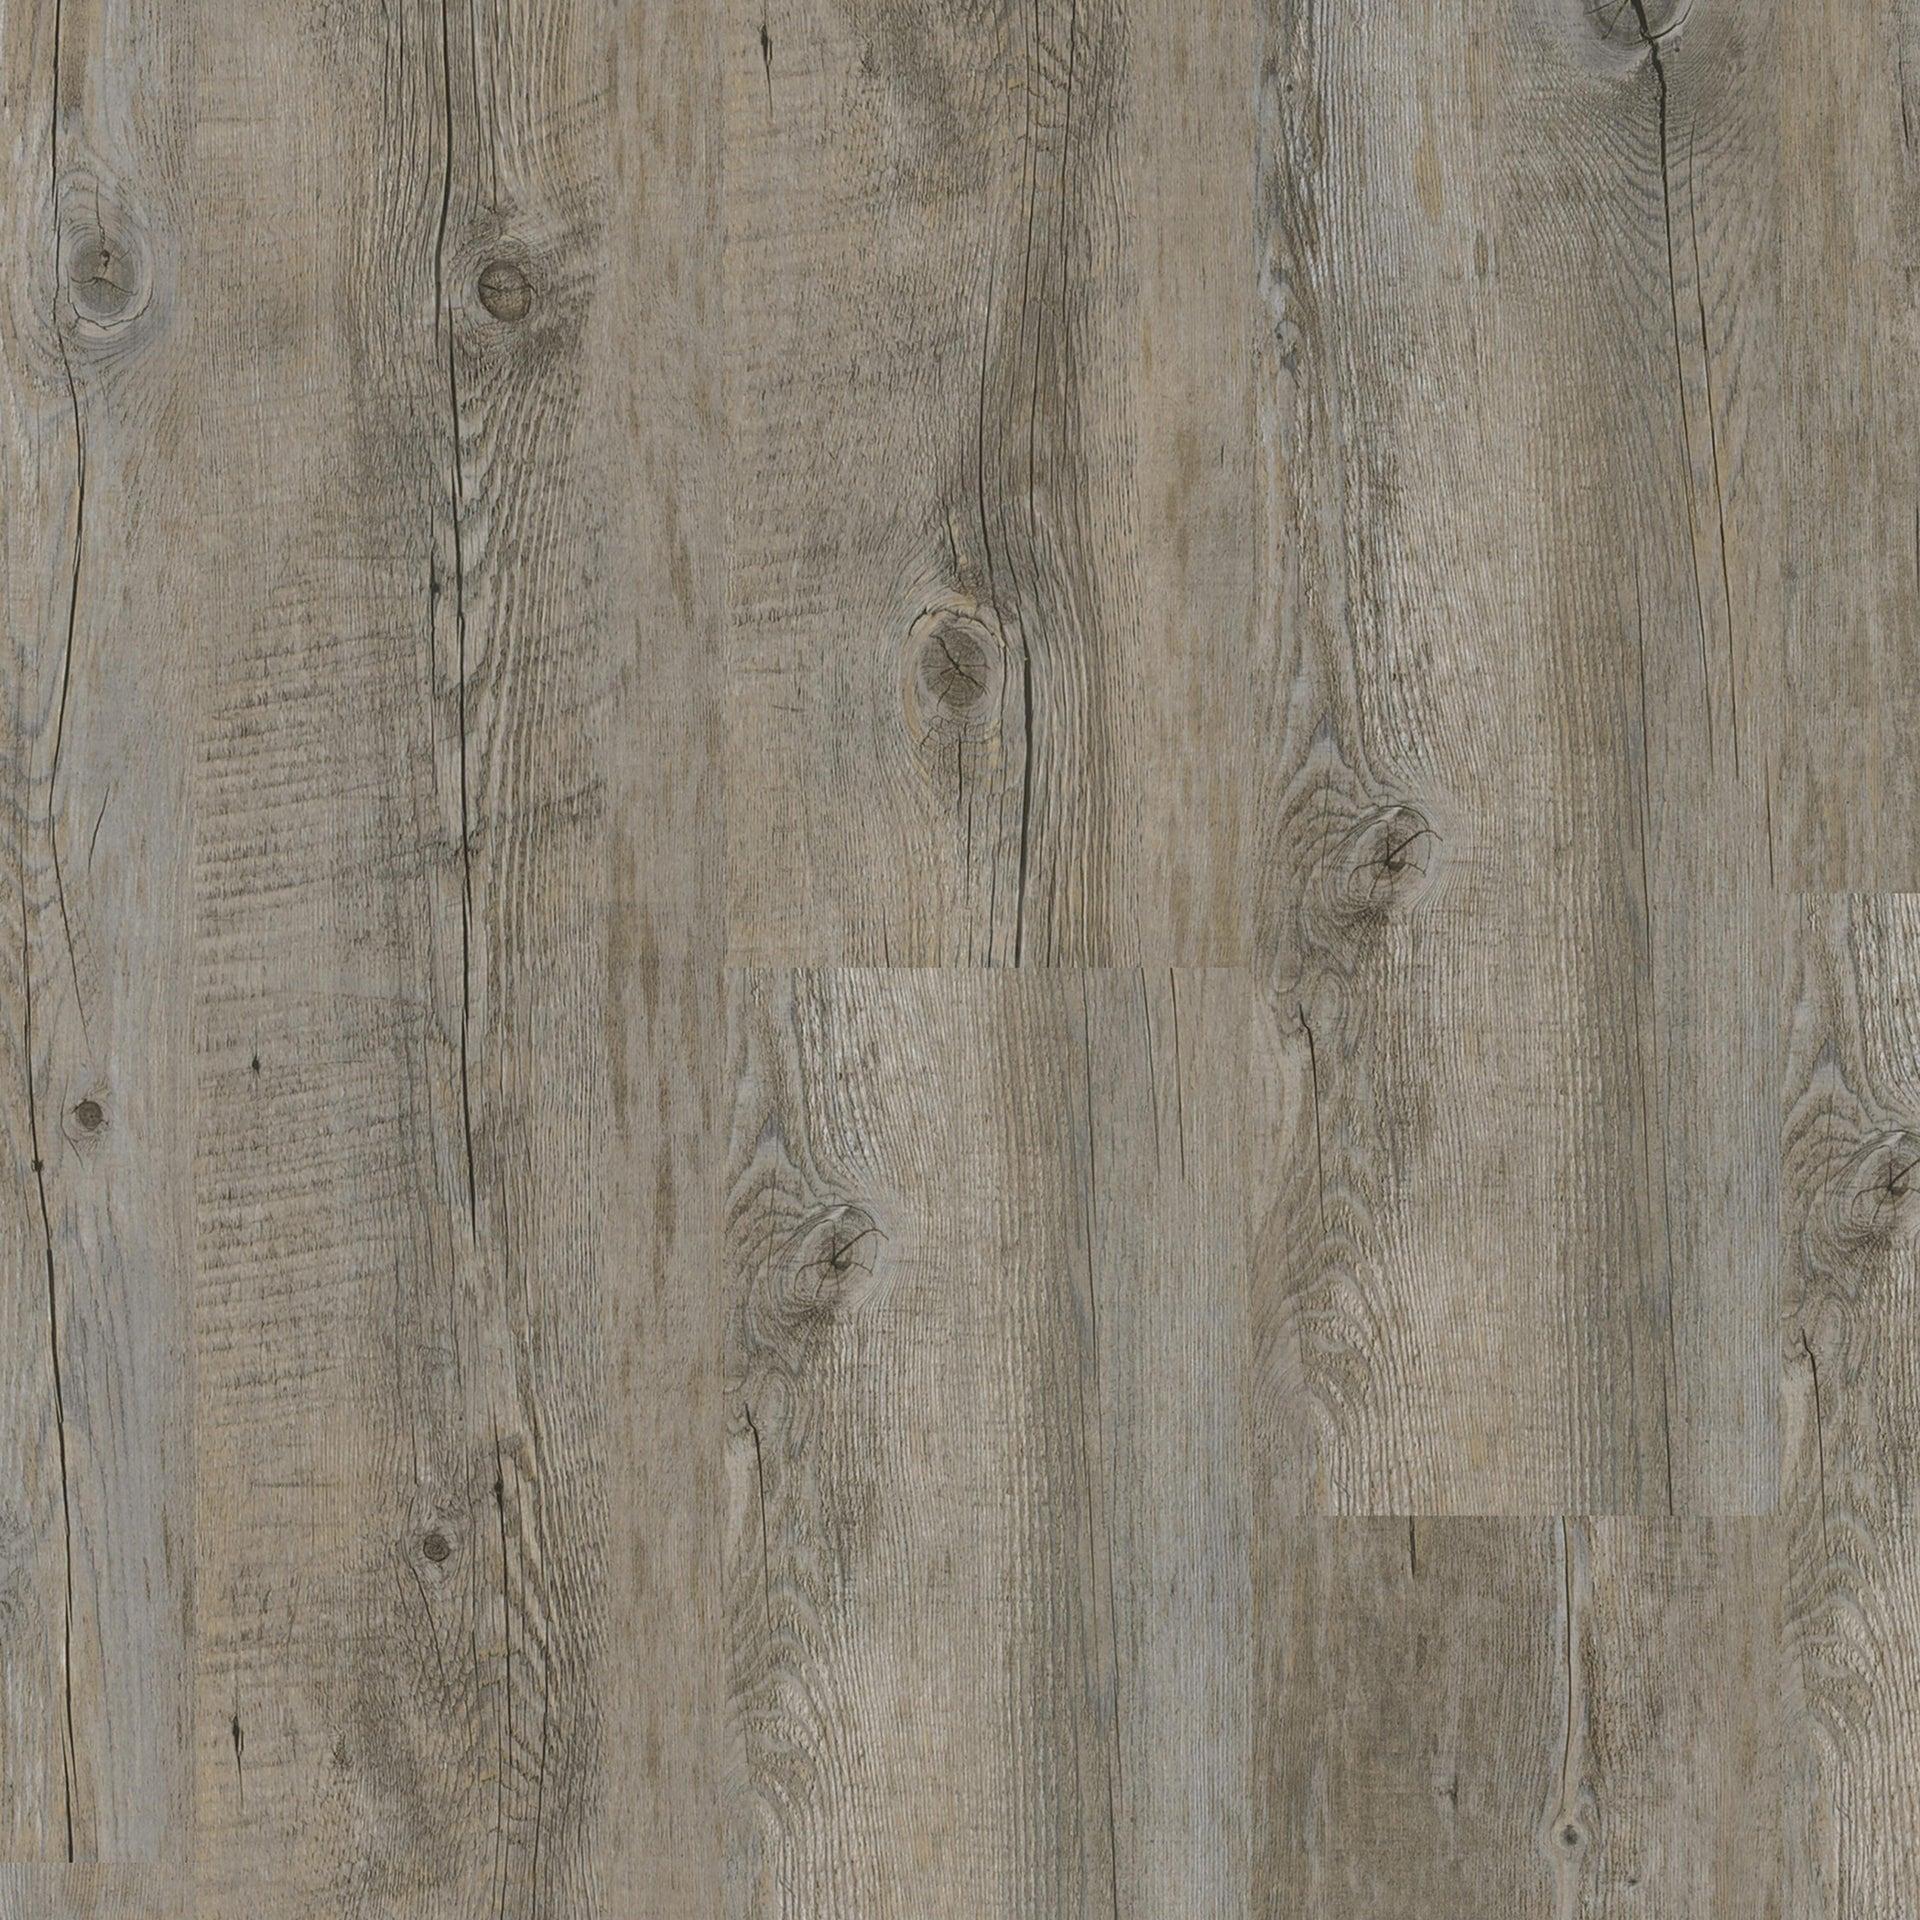 Pavimento PVC flottante clic+ Pecan Sp 4.5 mm grigio / argento - 7